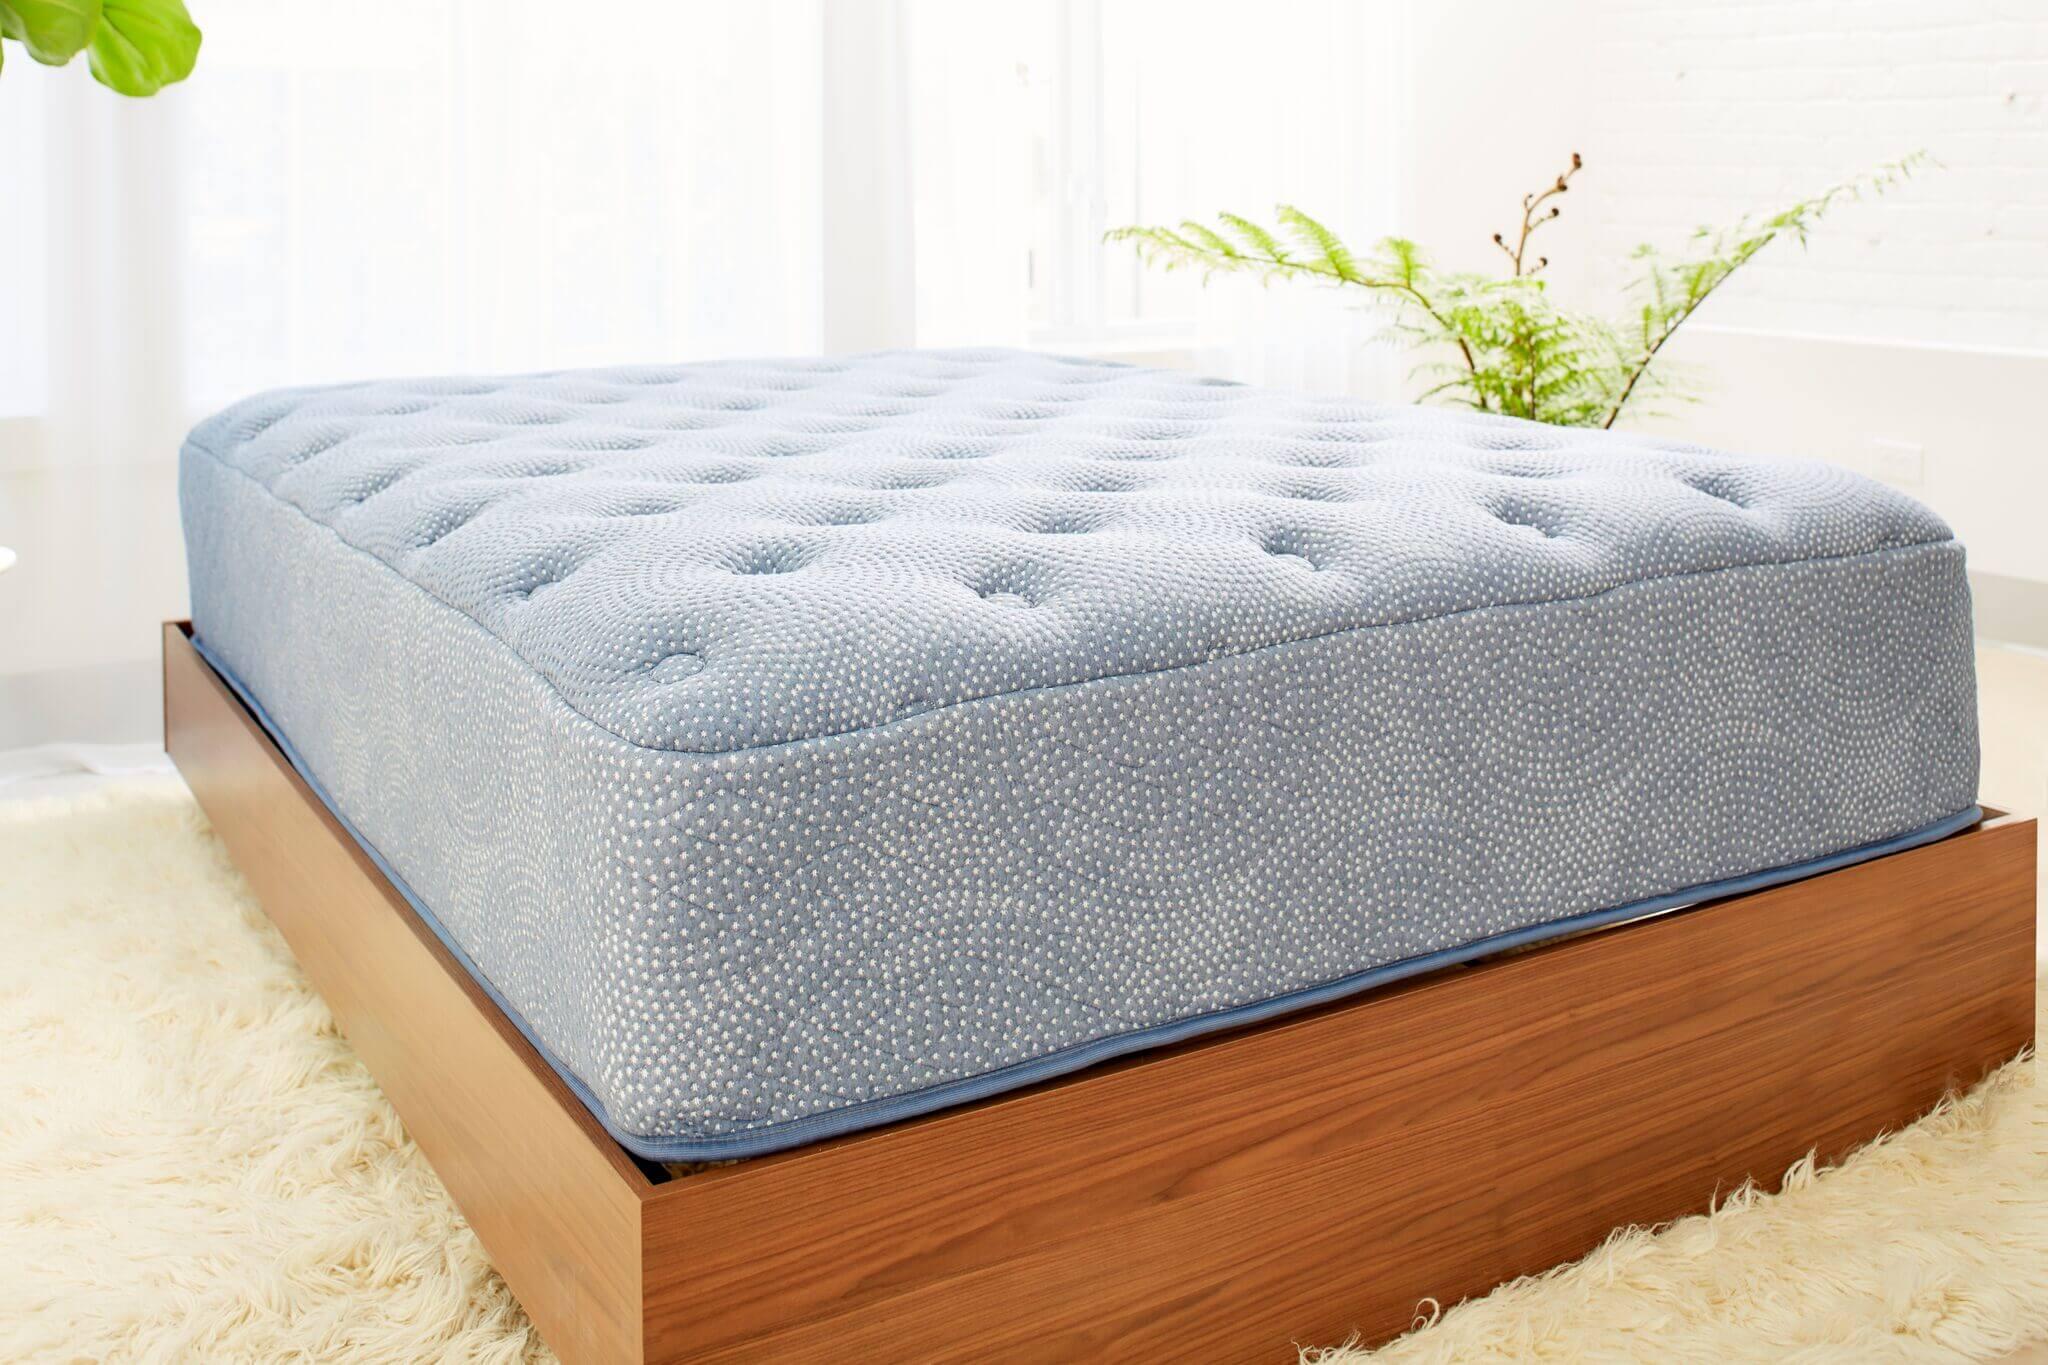 luft mattress giveaway, mattress giveaway, luft mattress, girl on the mattress giveaways